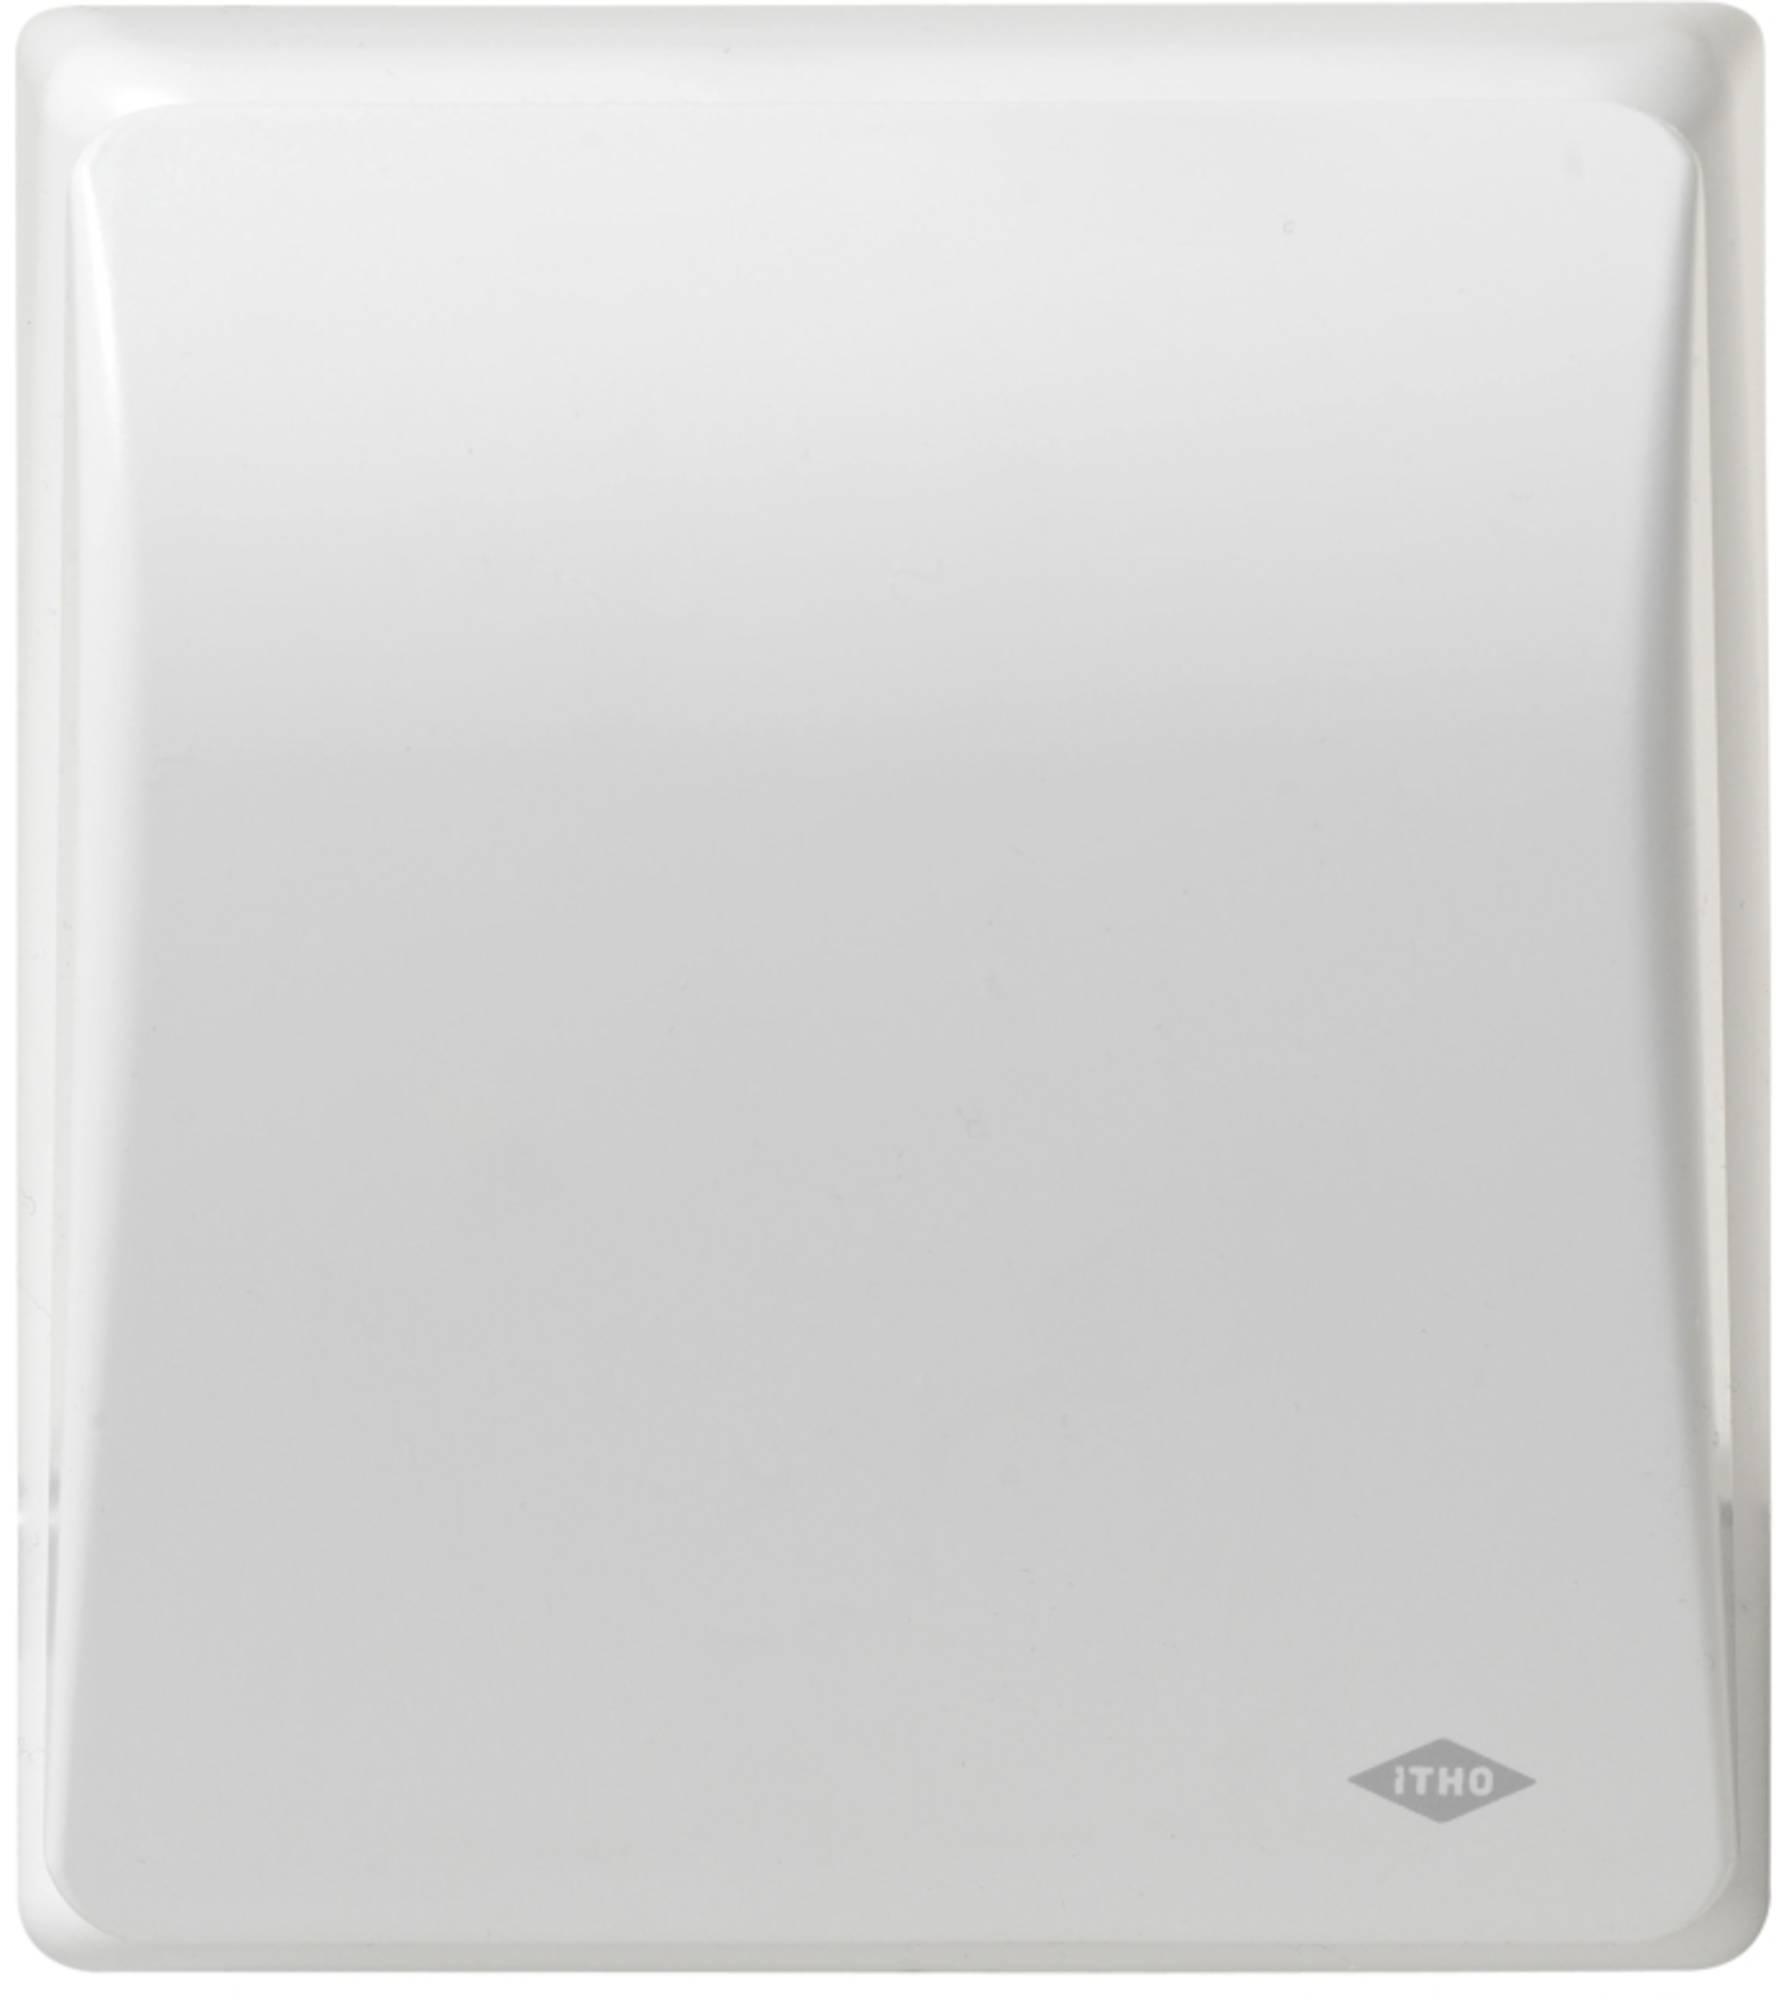 ITHO kanaalventilator 230v WIT (5400900N)